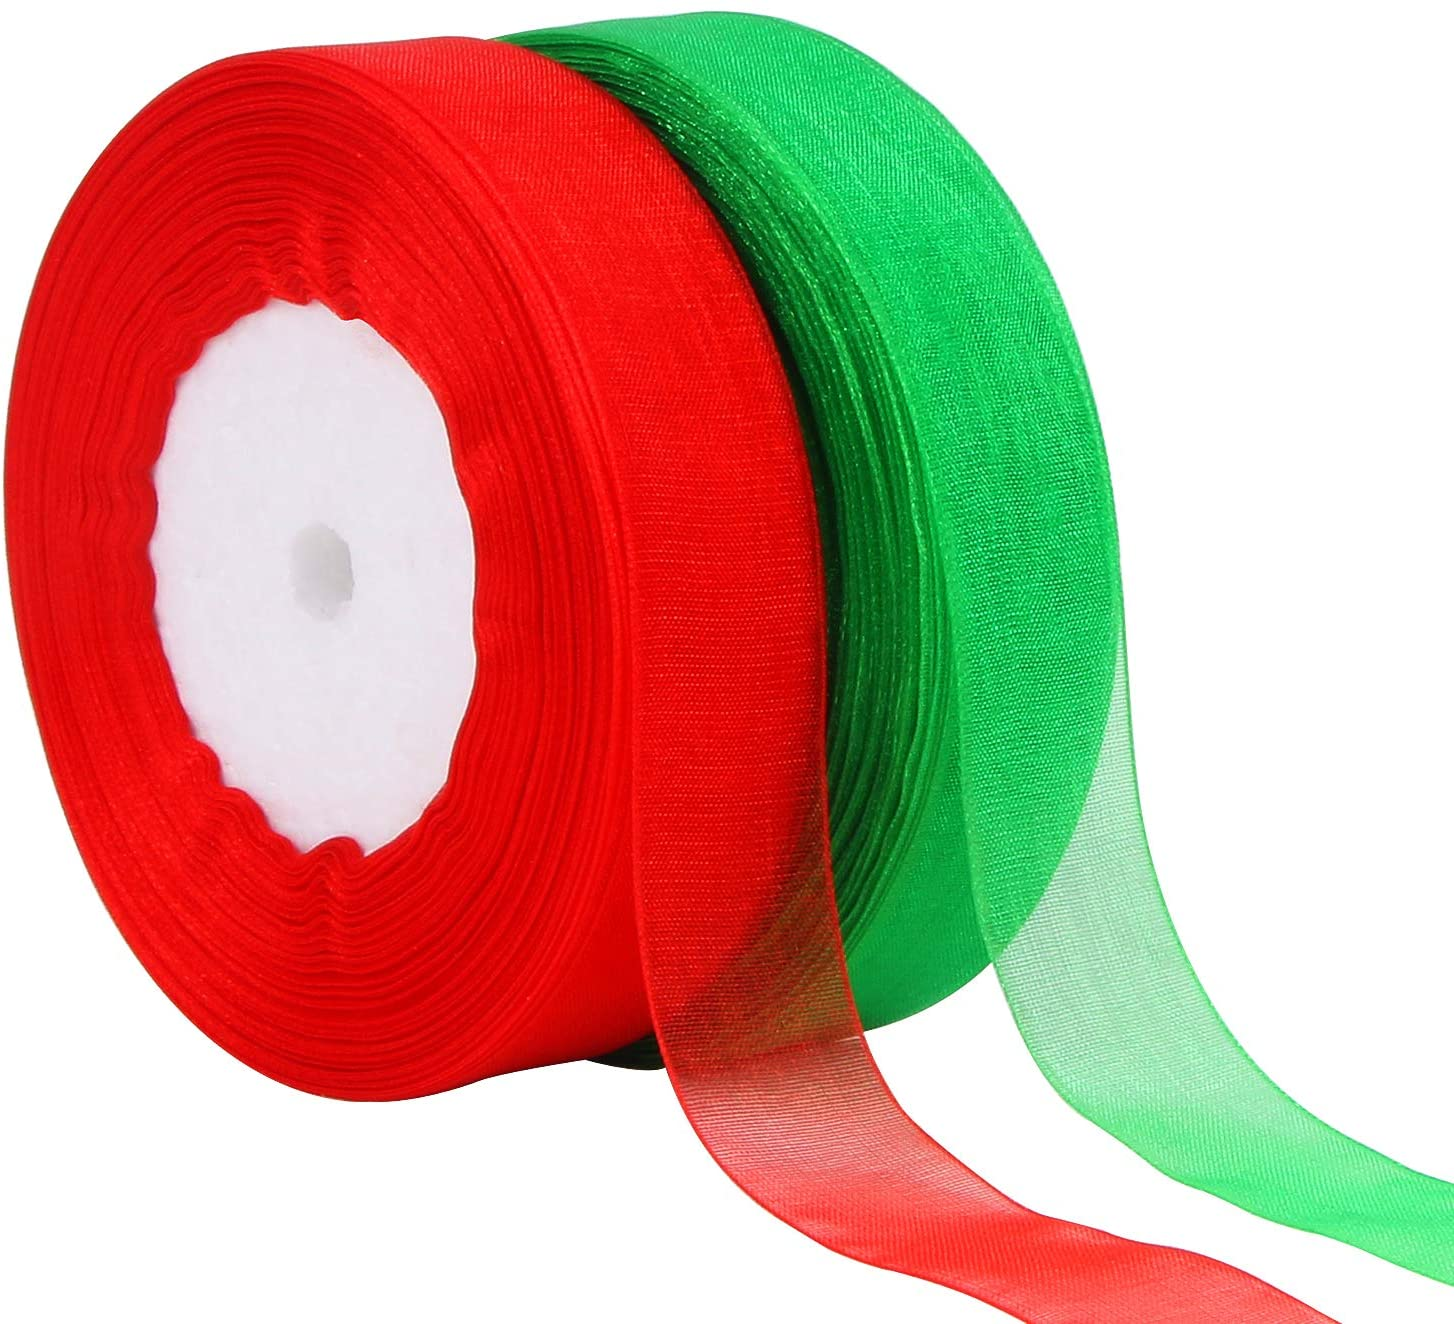 DECYOOL 2 Rolls 100 Yards Christmas Ribbons Organza Holiday Festival Ribbons 4/5